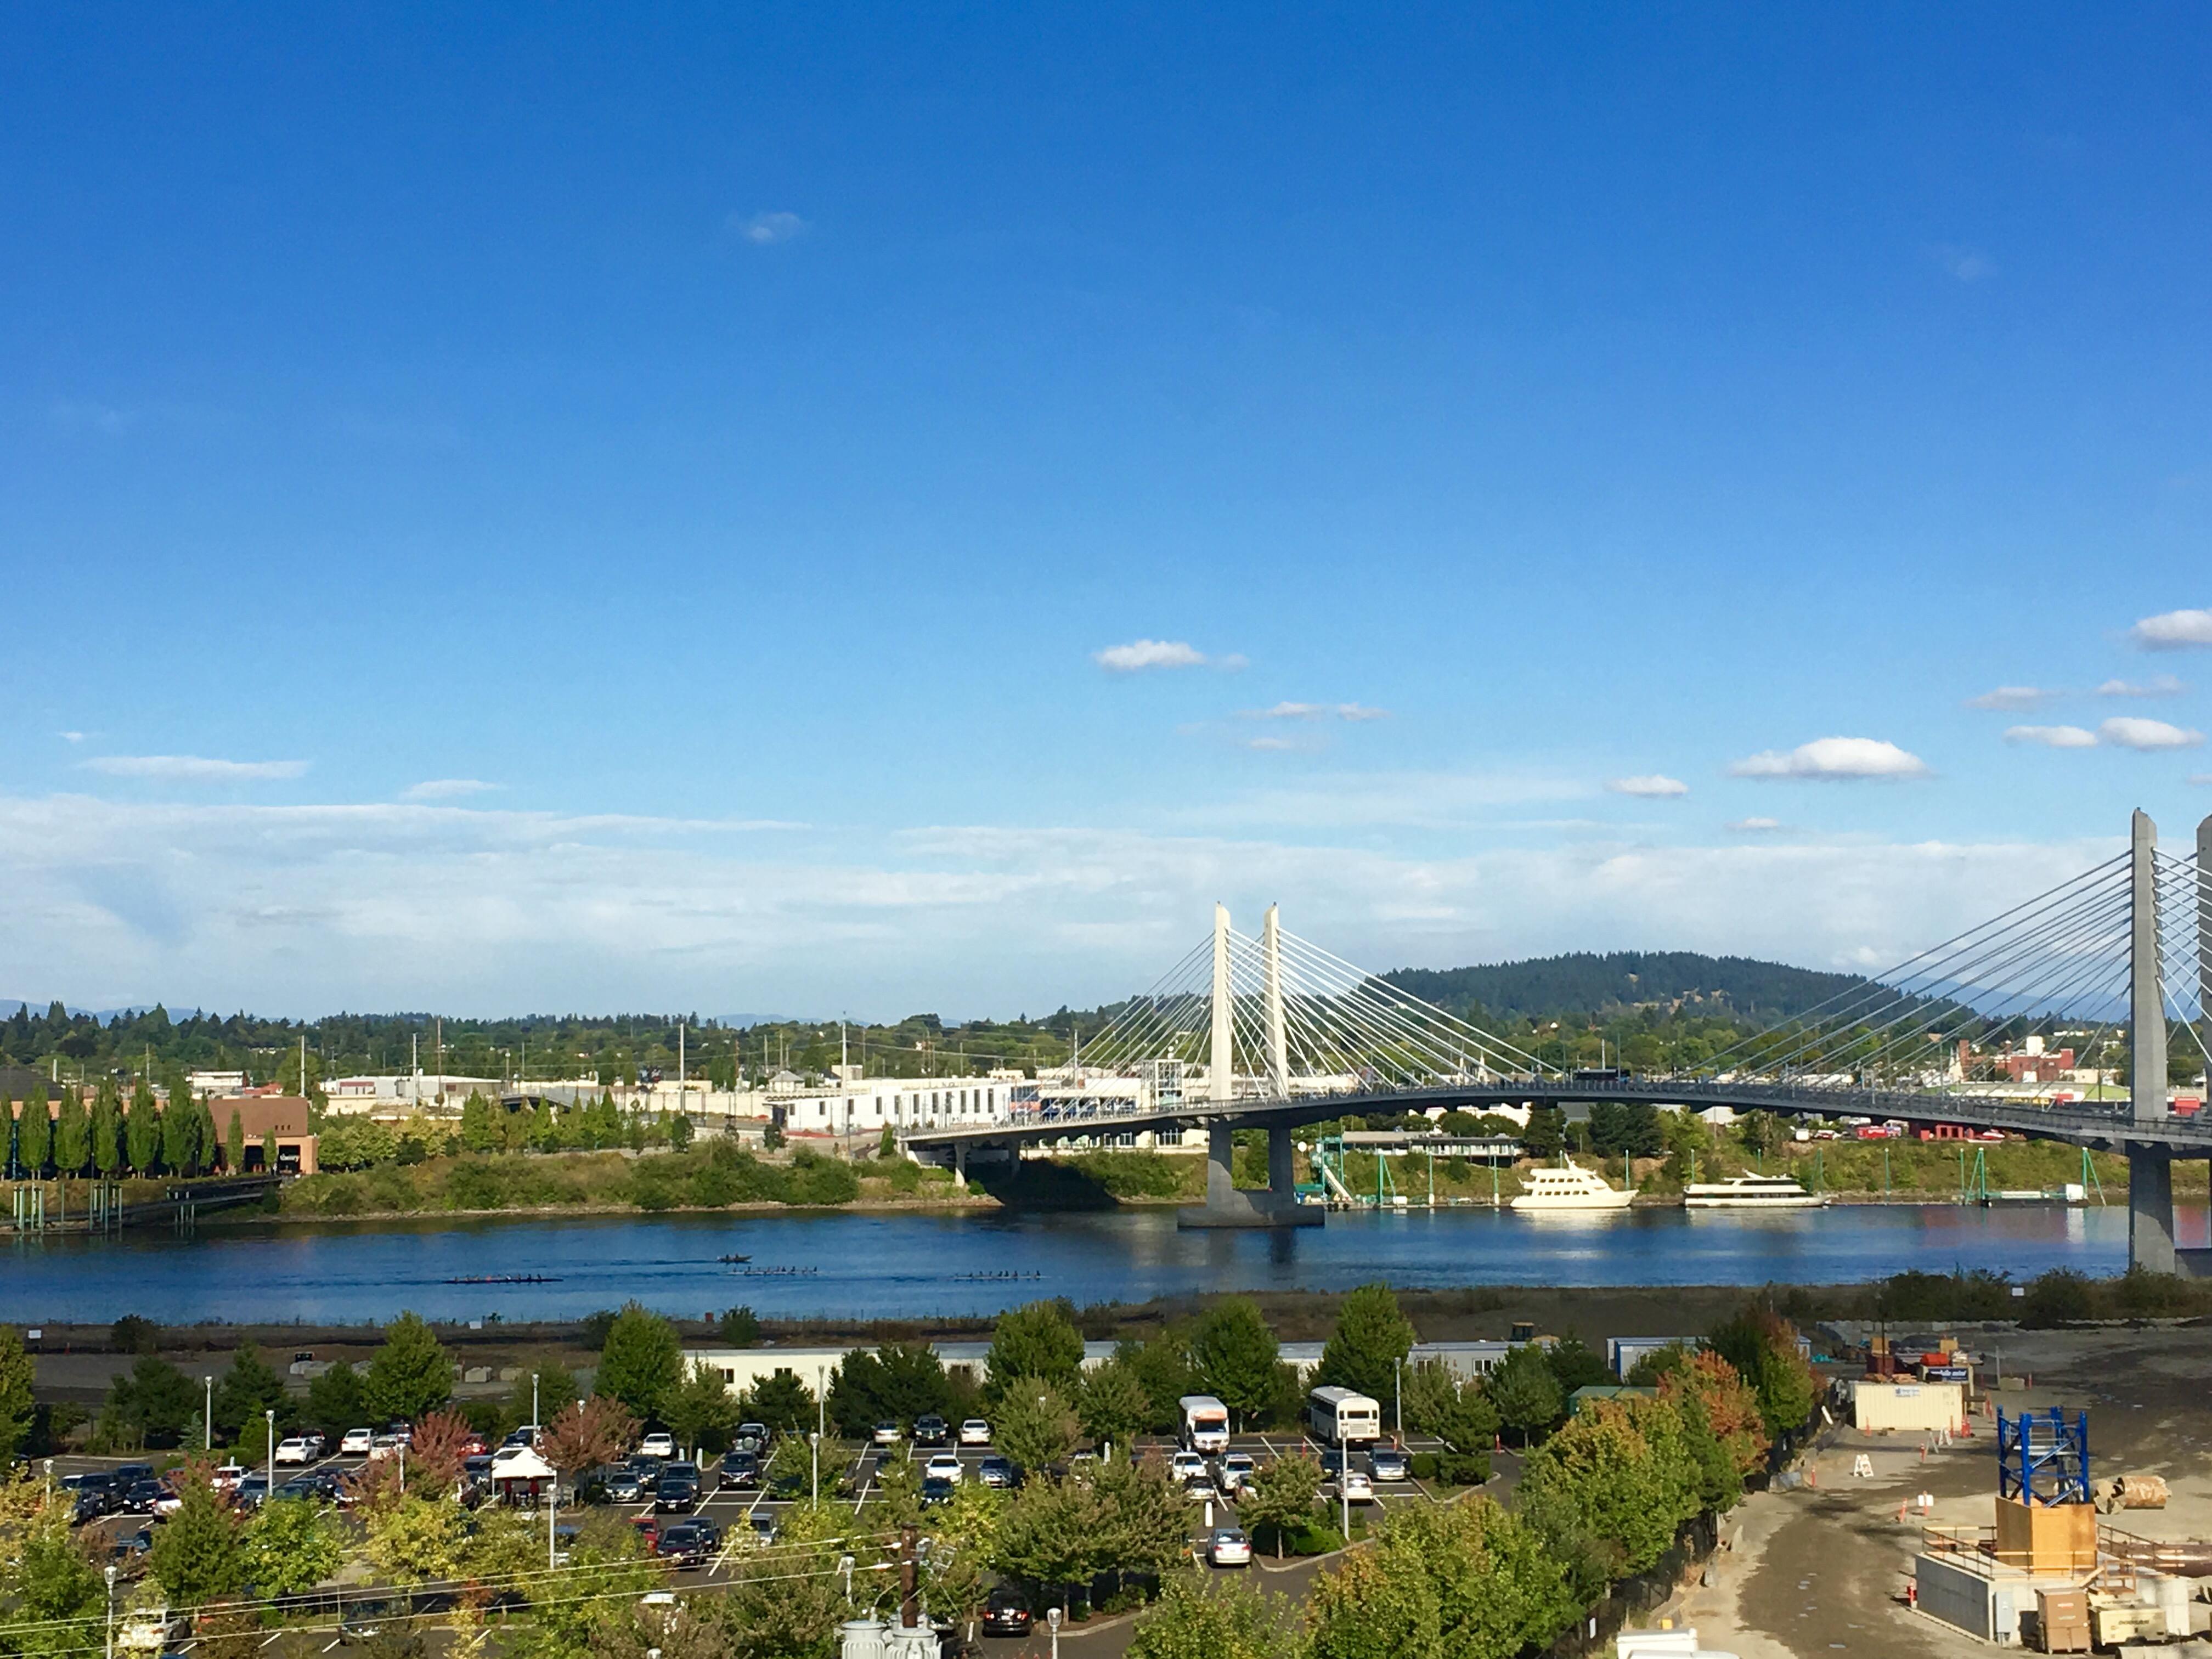 Biking in Portland, Oregon bridges